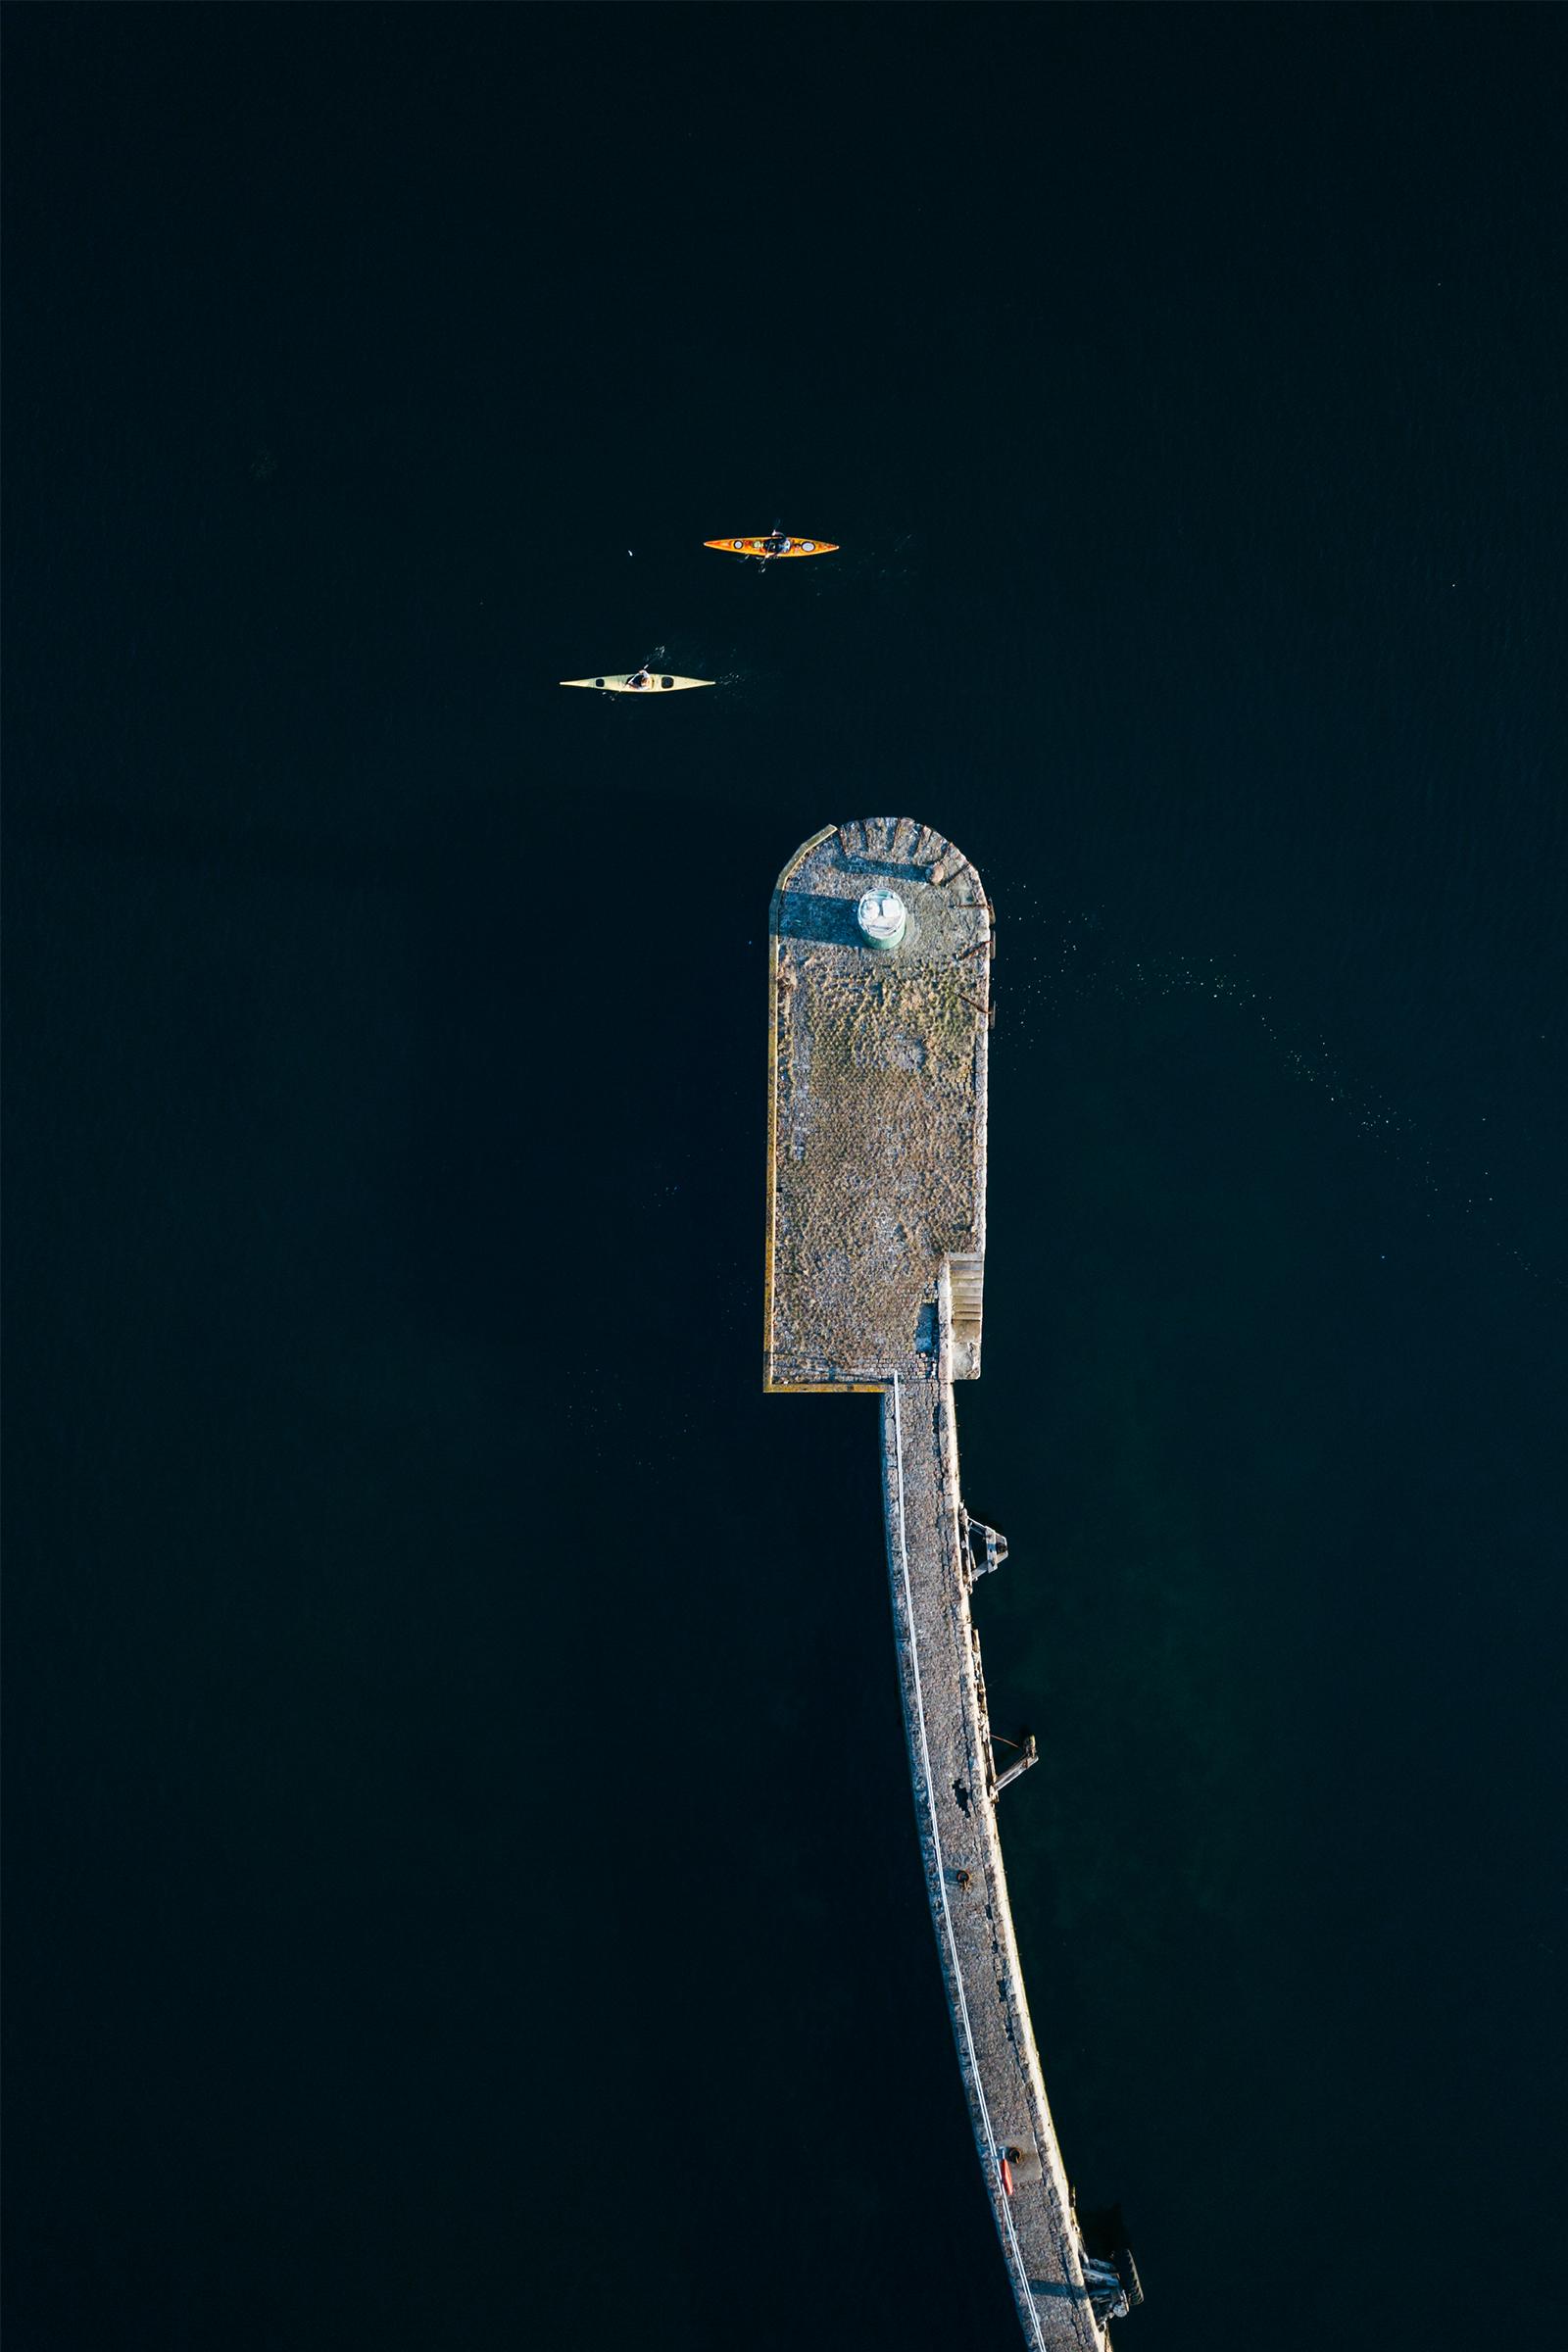 Nordhavn / Foto: Andreas Raun Arneberg